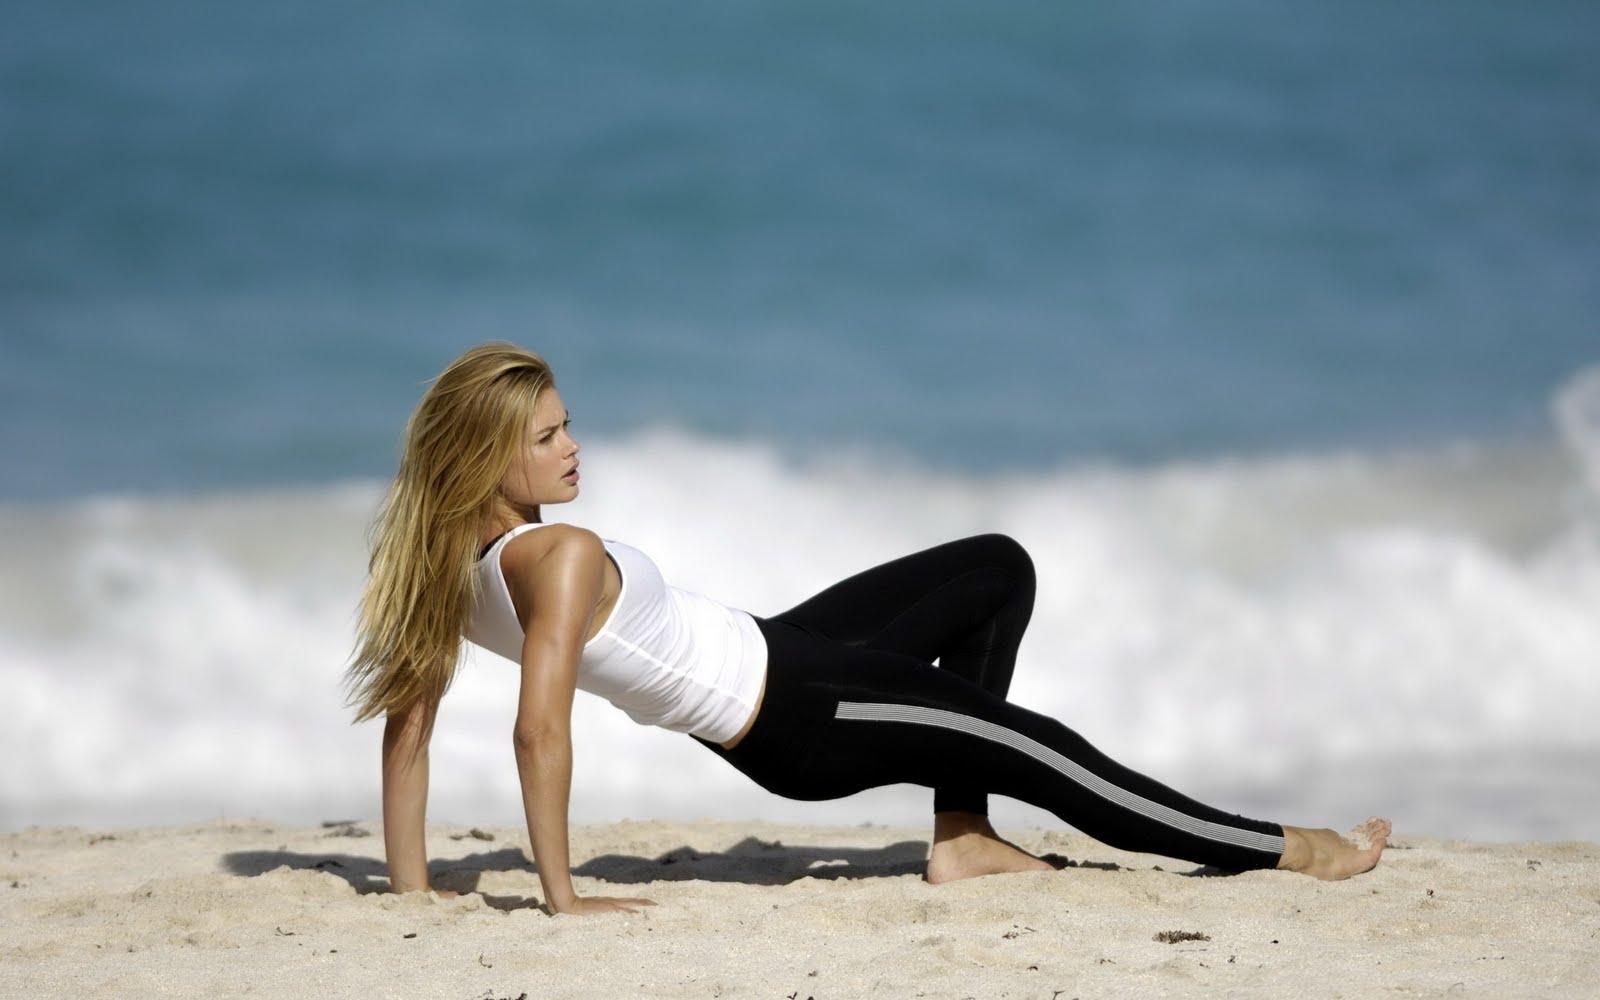 http://1.bp.blogspot.com/-YBOkMQmMBHg/Tc2FGMztREI/AAAAAAAACAI/2rJye6YaATs/s1600/doutzen-kroes-fitness-wallpaper.jpg